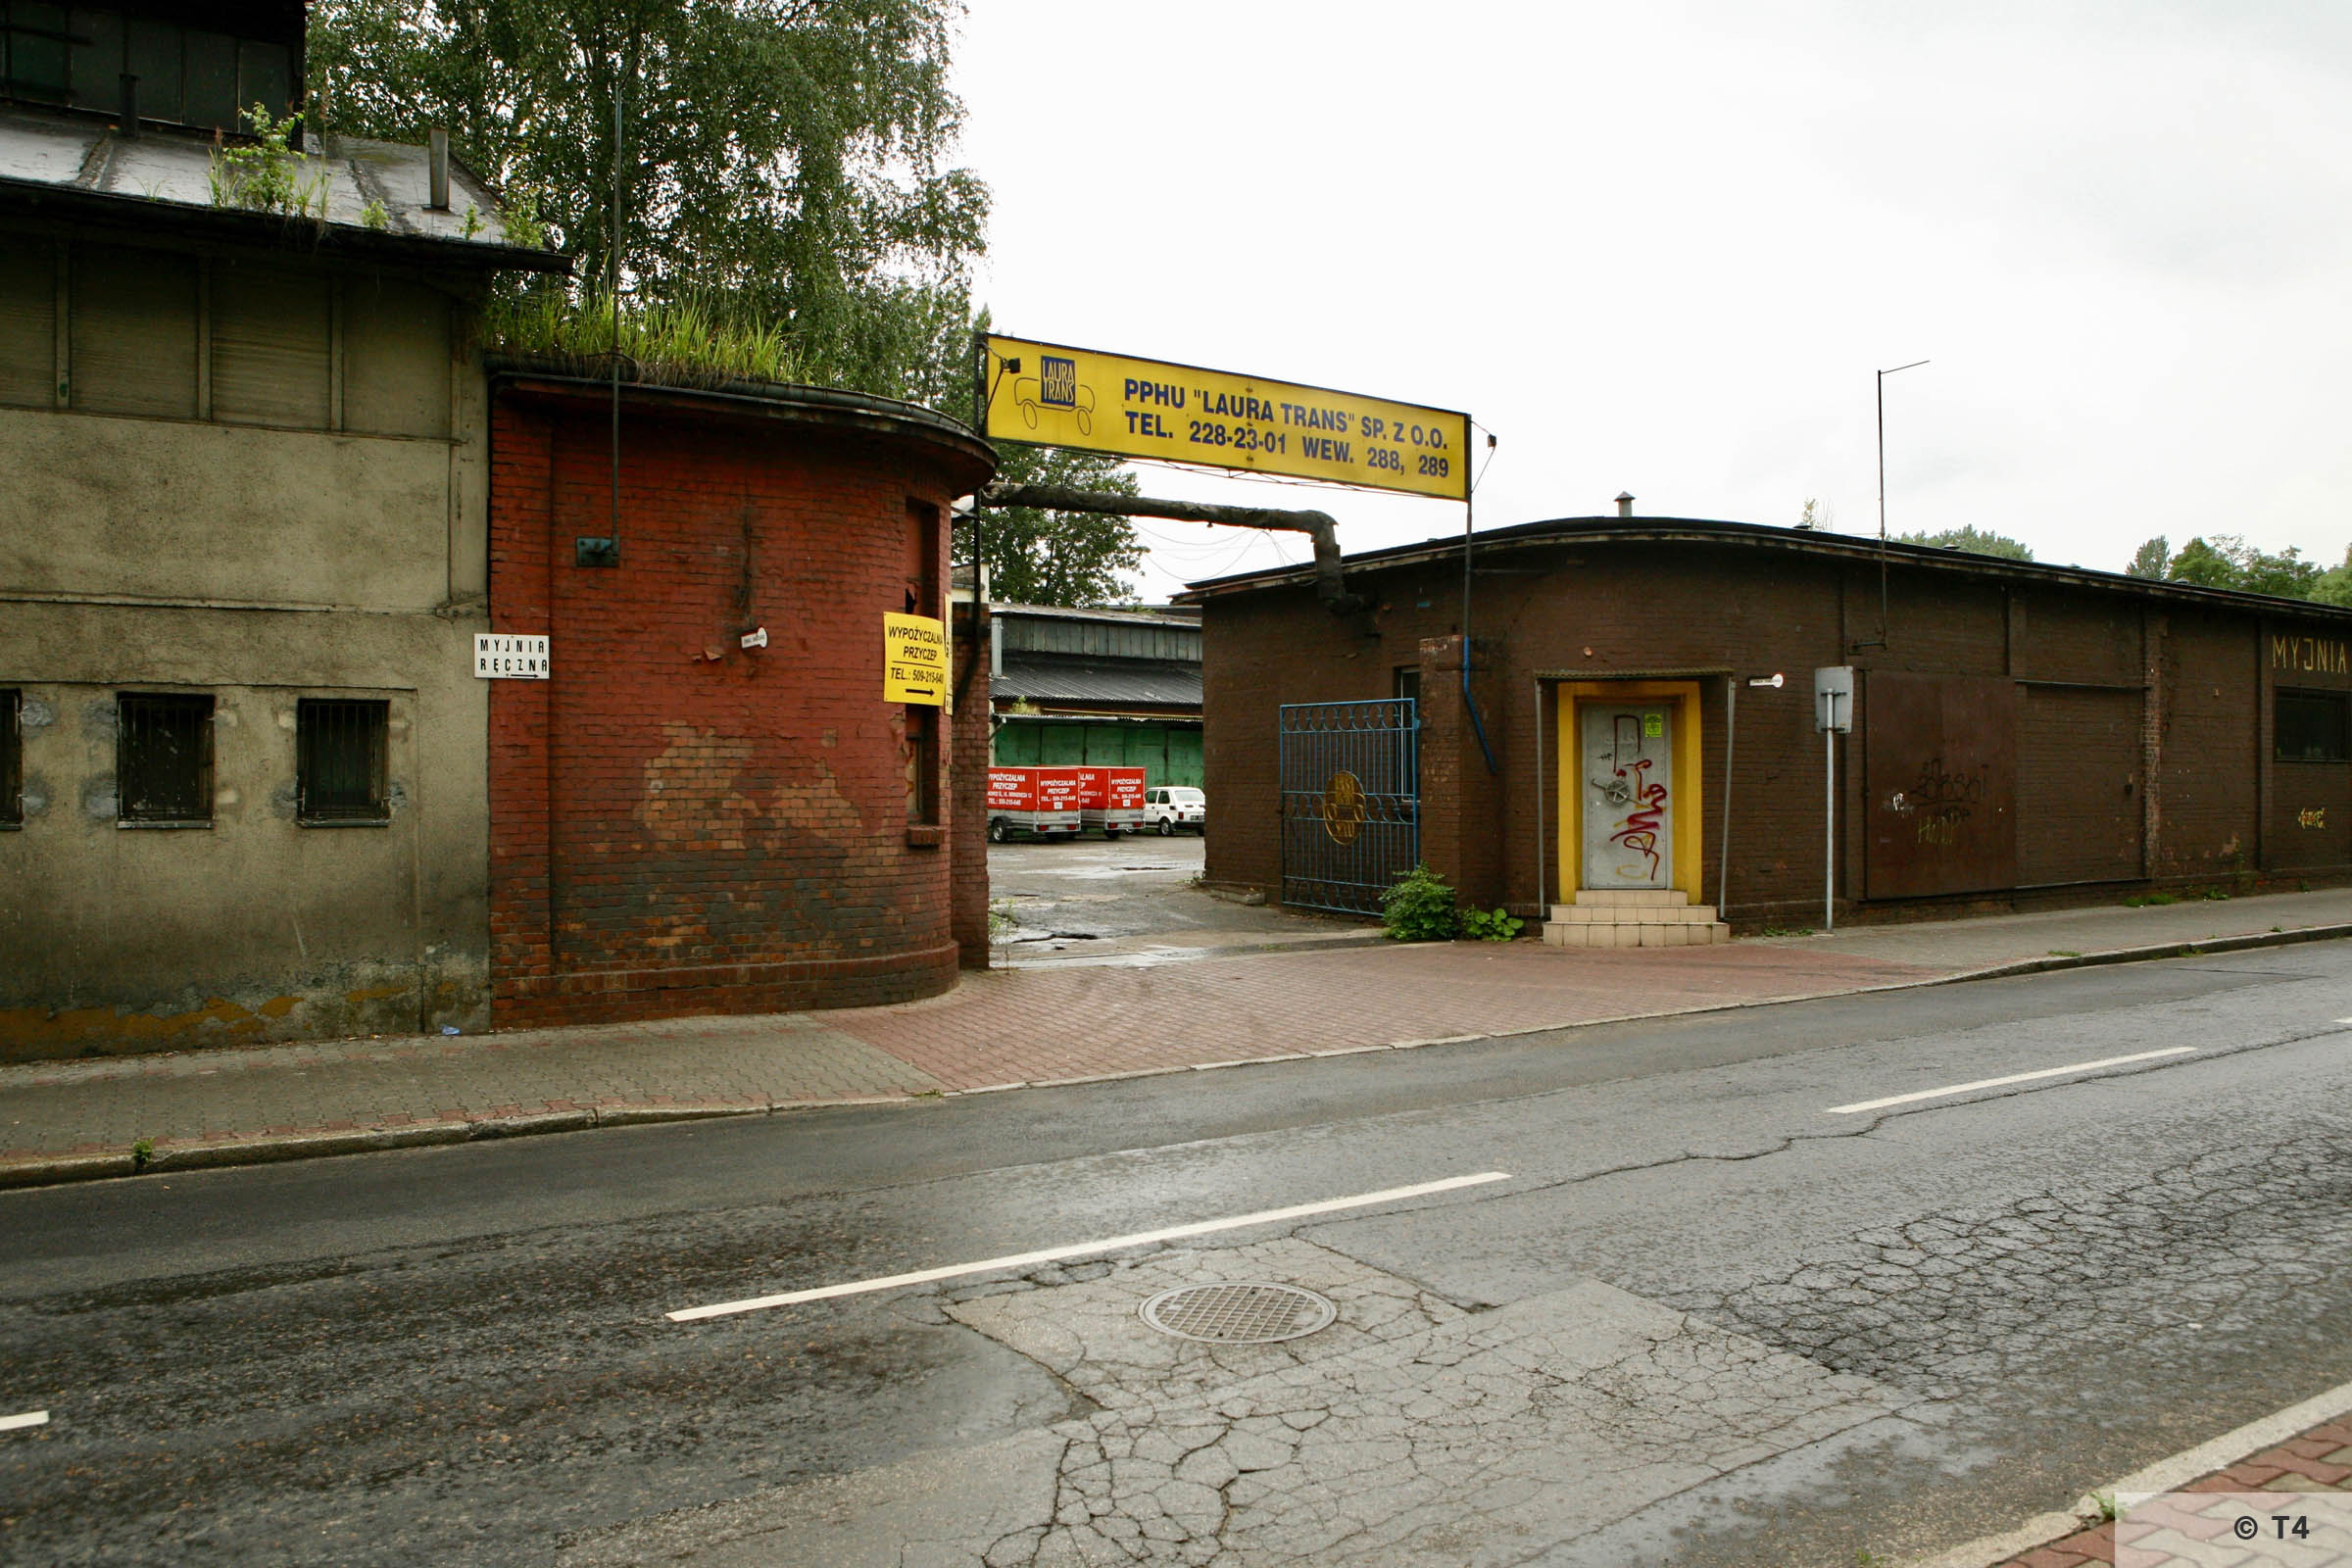 Entrance gate to the former Arbeitslager Laurahütte sub camp. Workshop on the left where prisoners slept. 2007 T4 9526